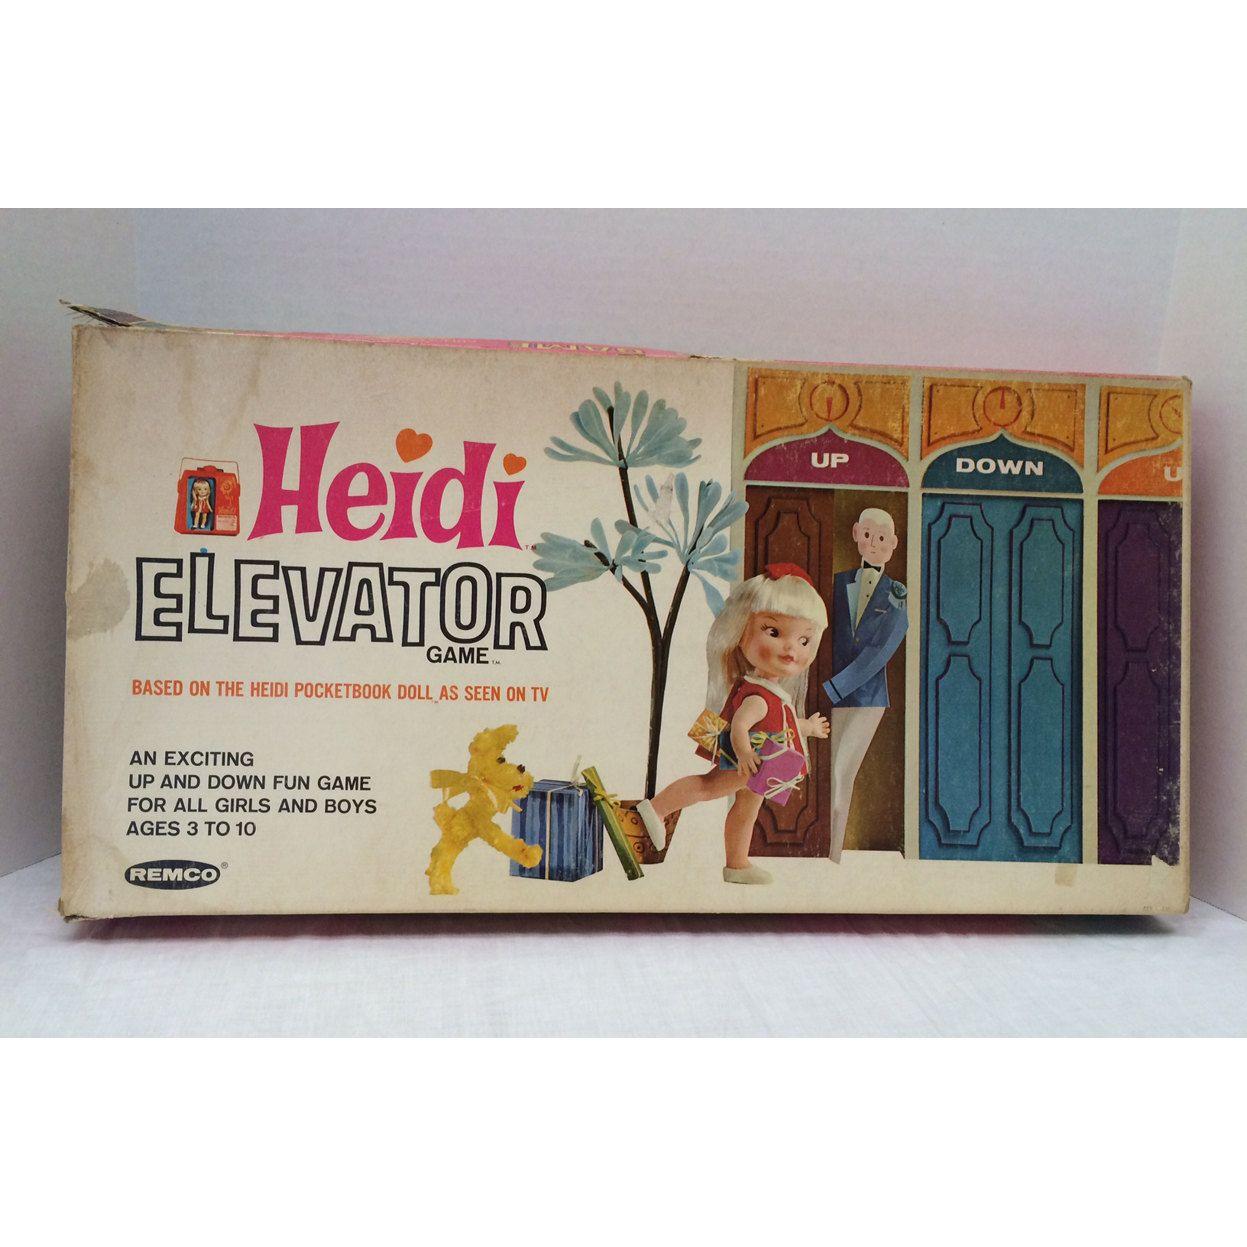 1965 Heidi Elevator Game Remco Industries Board Game Heidi Pocketbook Doll HTF - pinned by pin4etsy.com